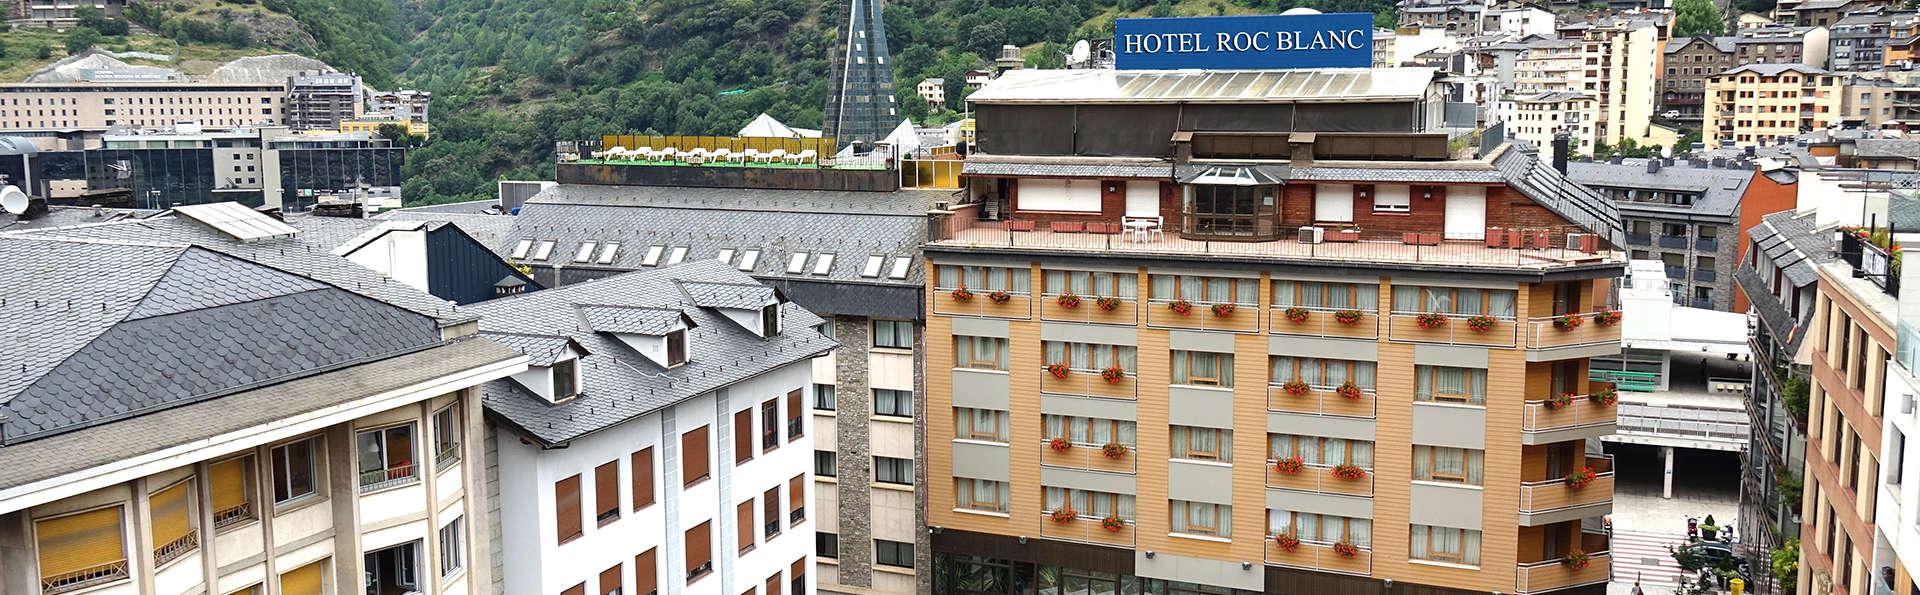 Hotel Roc Blanc & Spa - edit_front4.jpg